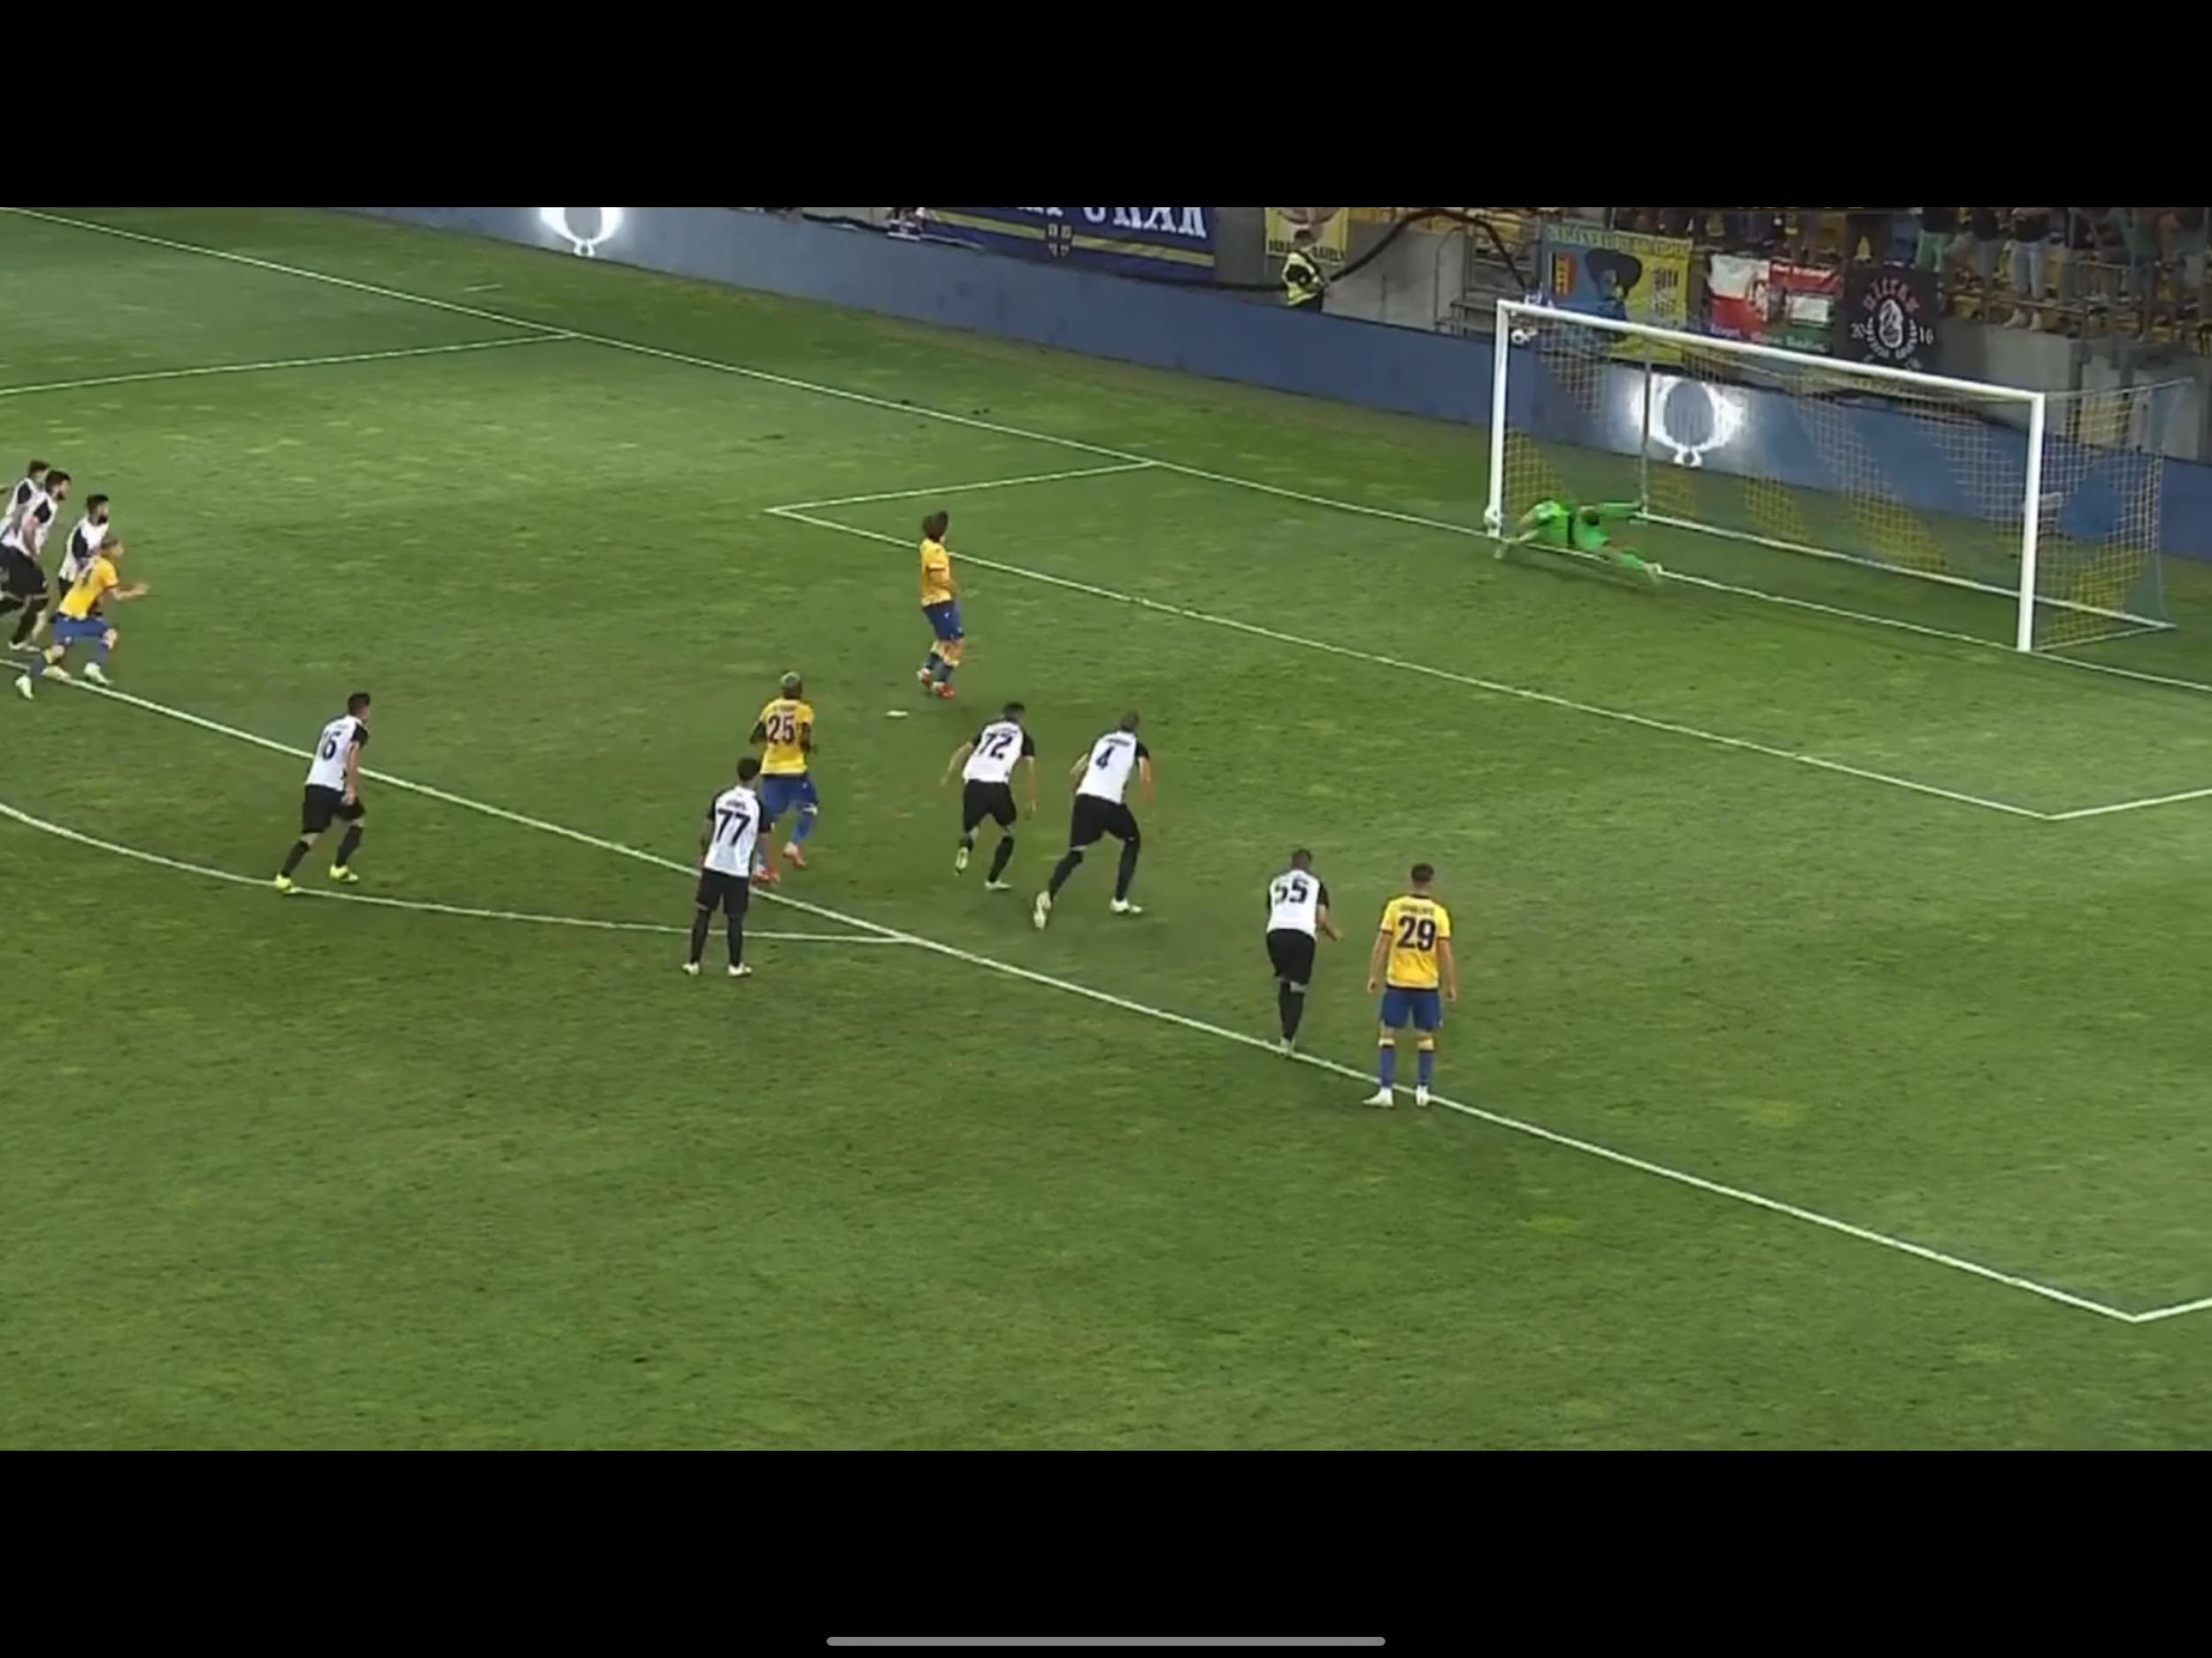 TV Izveštaj: Dunajska Streda-Partizan 0:2. Spasilac Popović sprečio nepotrebnu dramu (VIDEO)